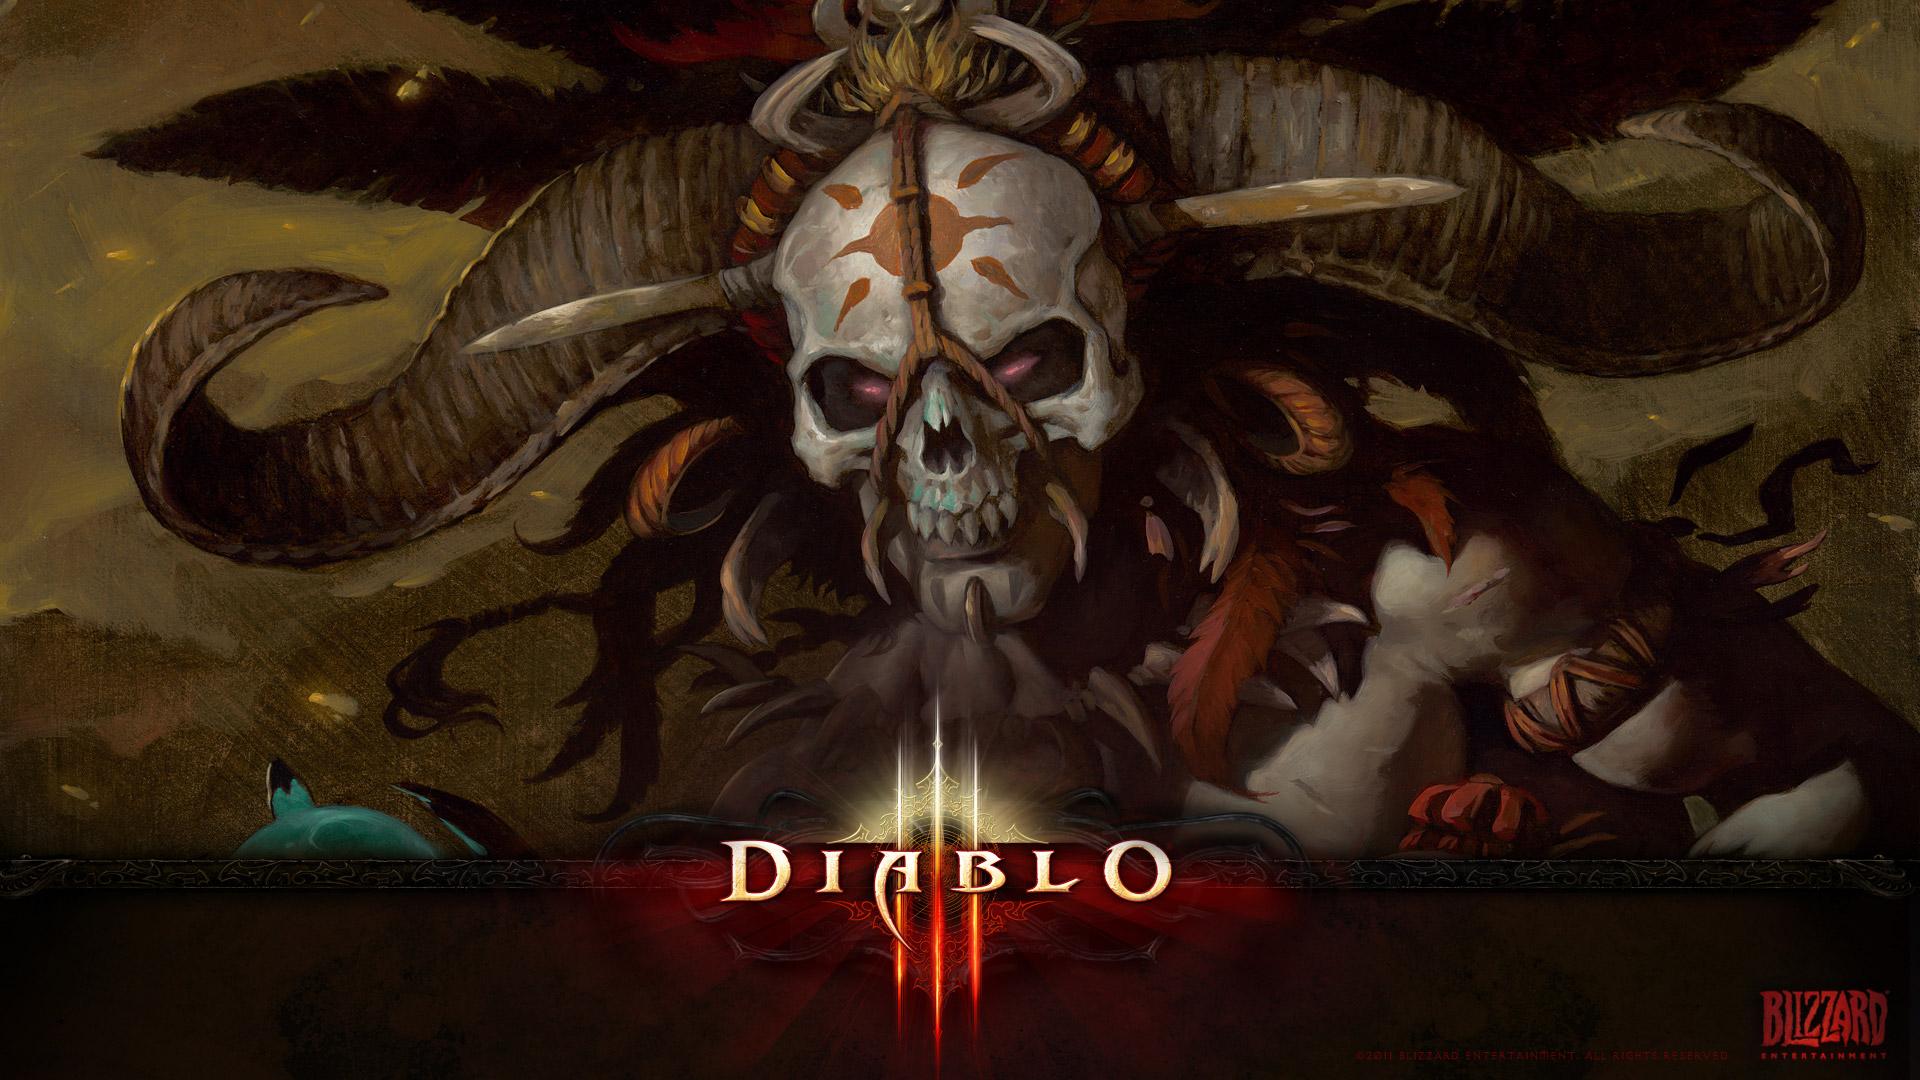 Diablo 3 wallpaper 32